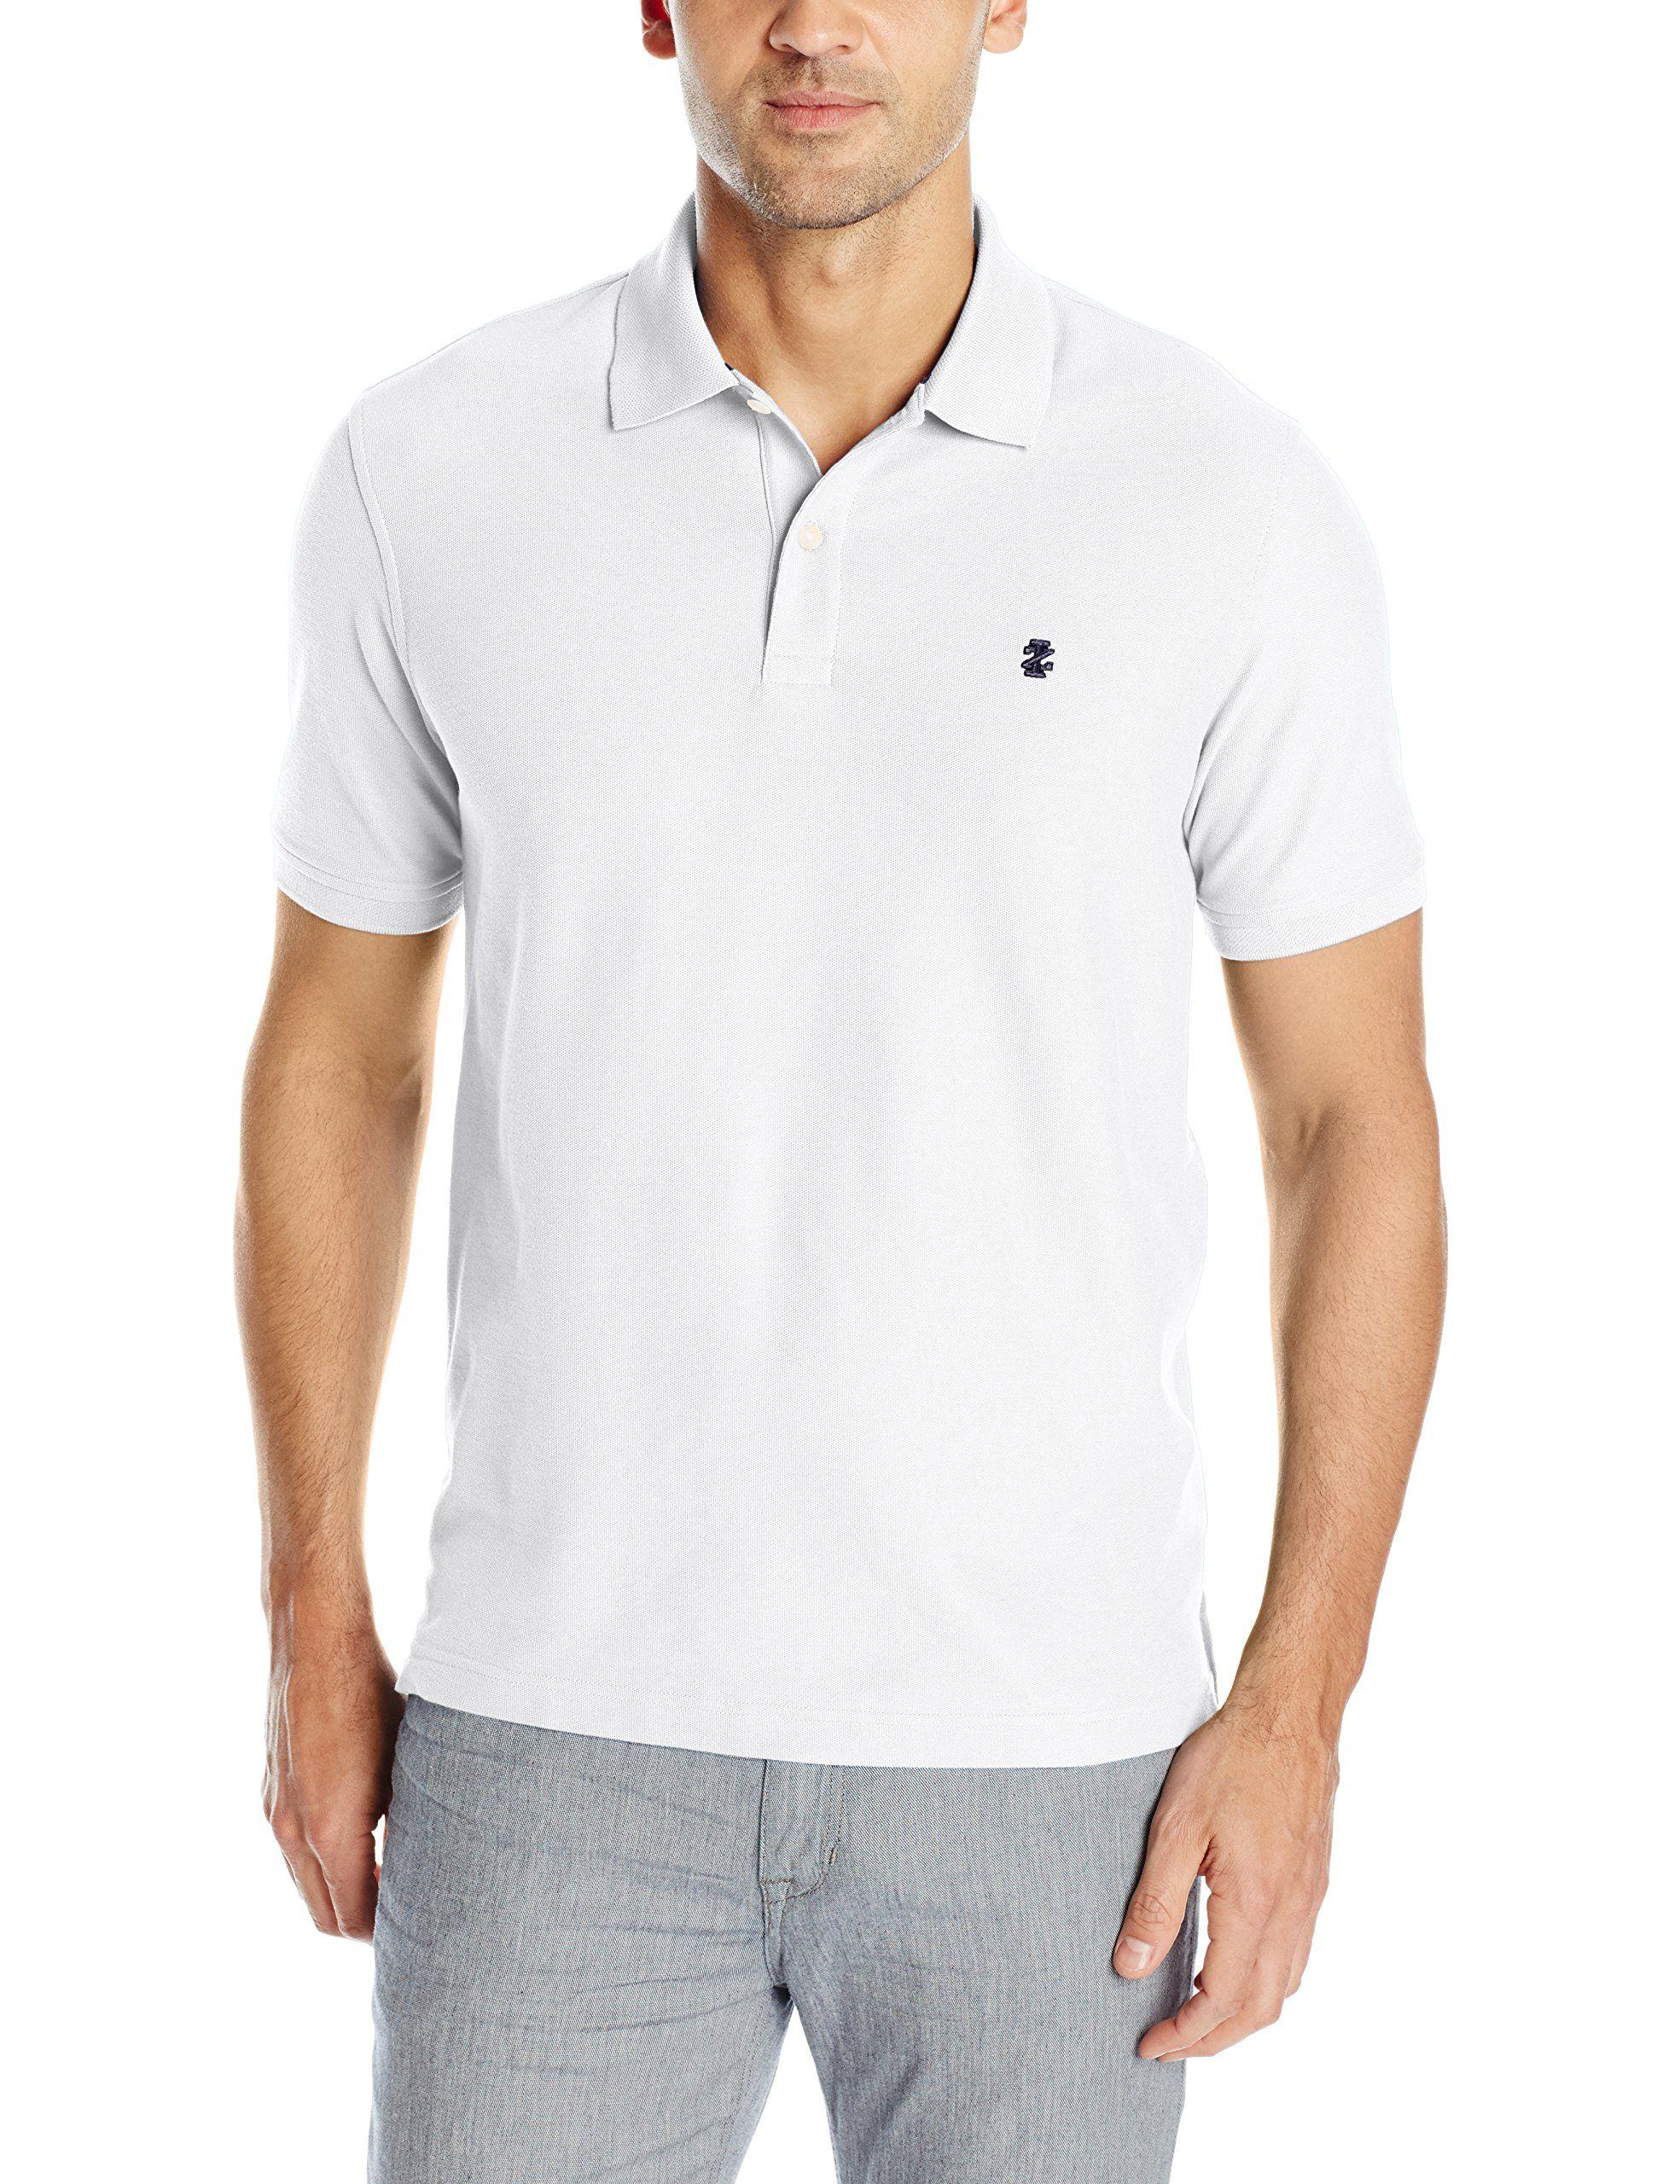 Izod Mens Advantage Performance Solid Polo White Medium Apparel